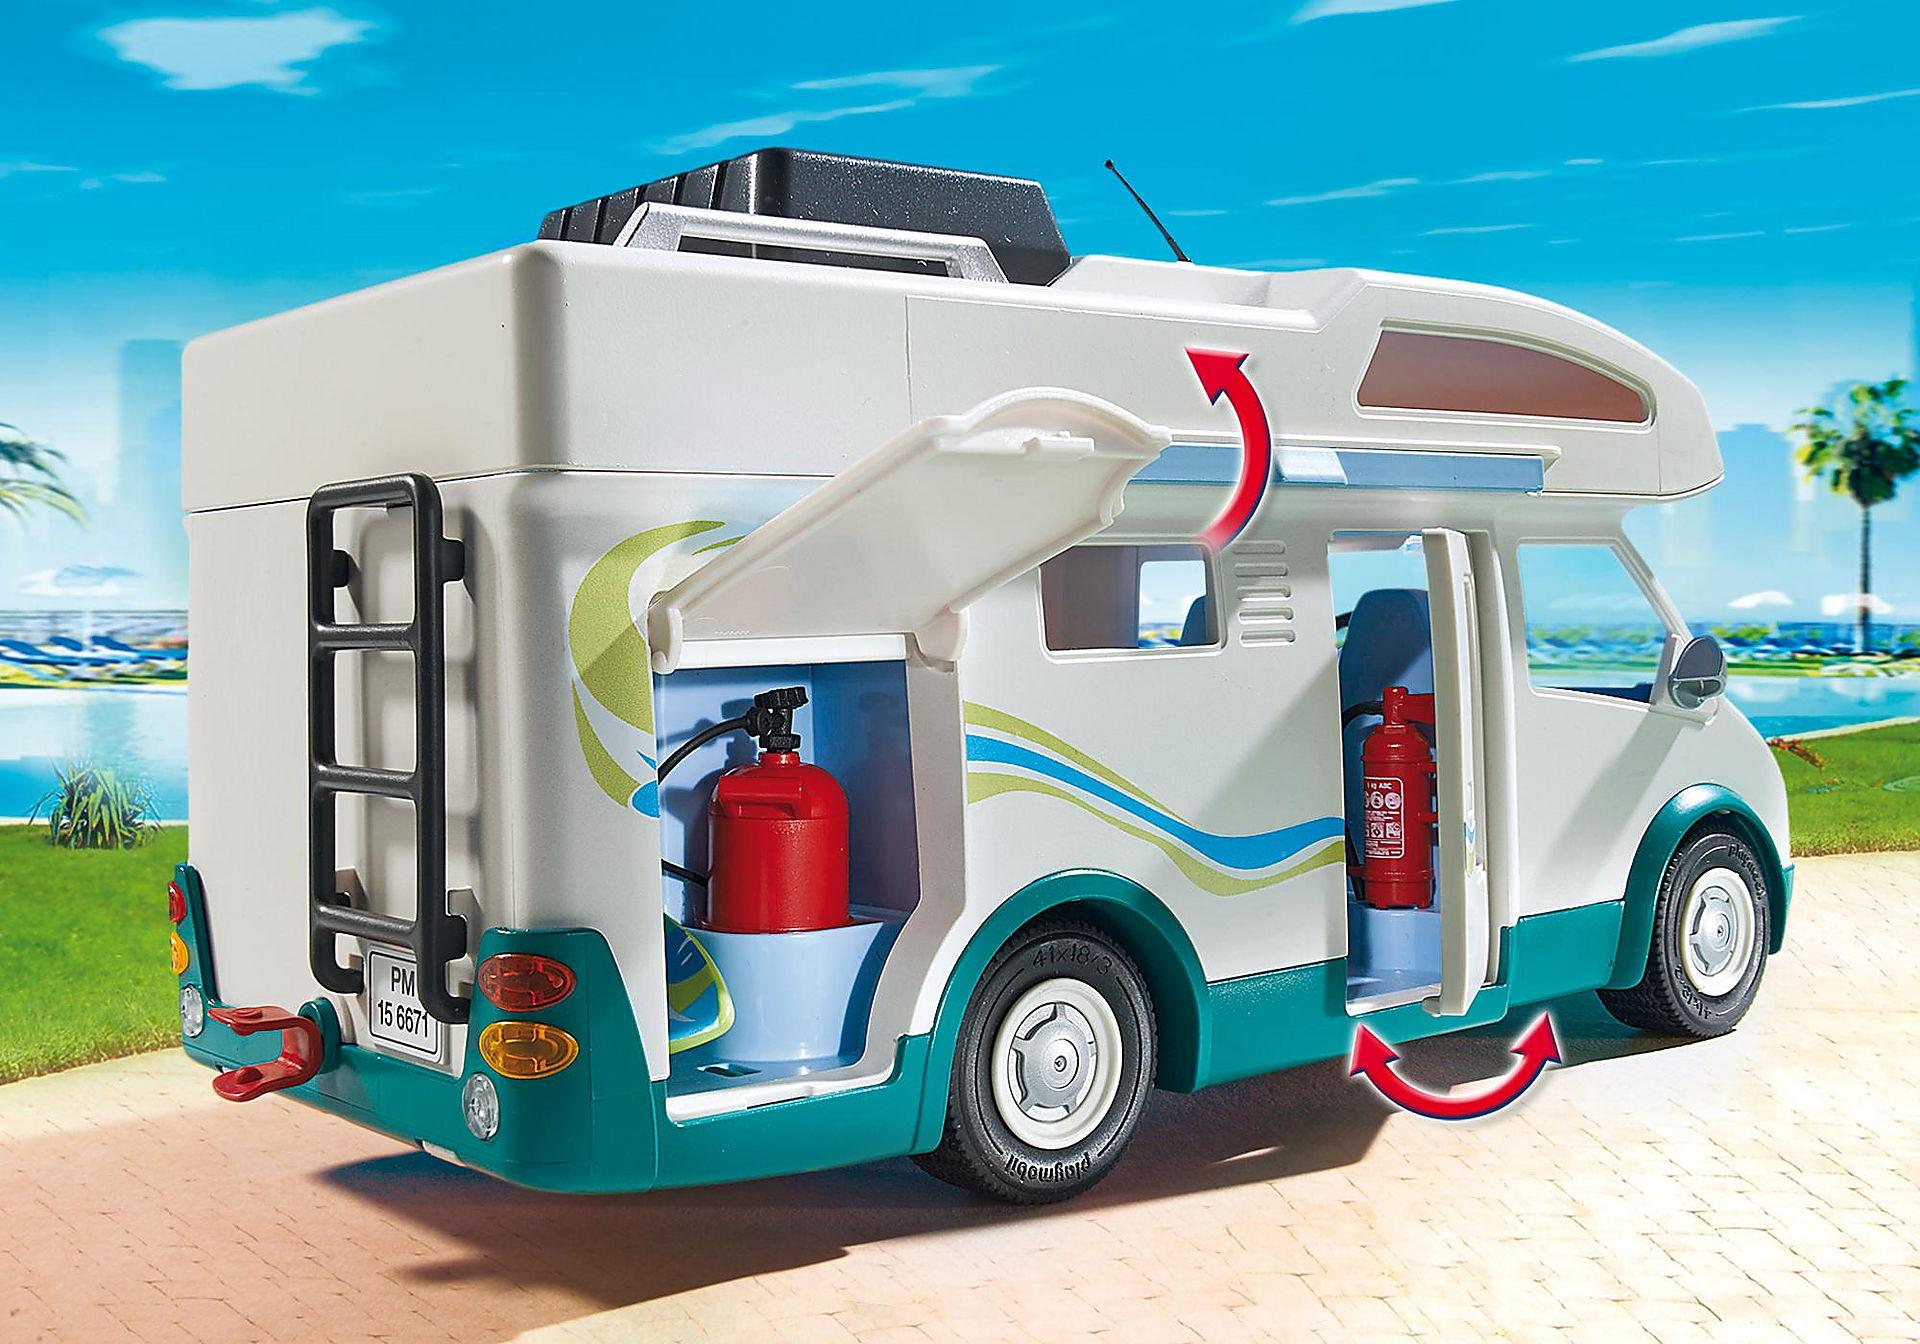 http://media.playmobil.com/i/playmobil/6671_product_extra1/Rodzinne auto kempingowe